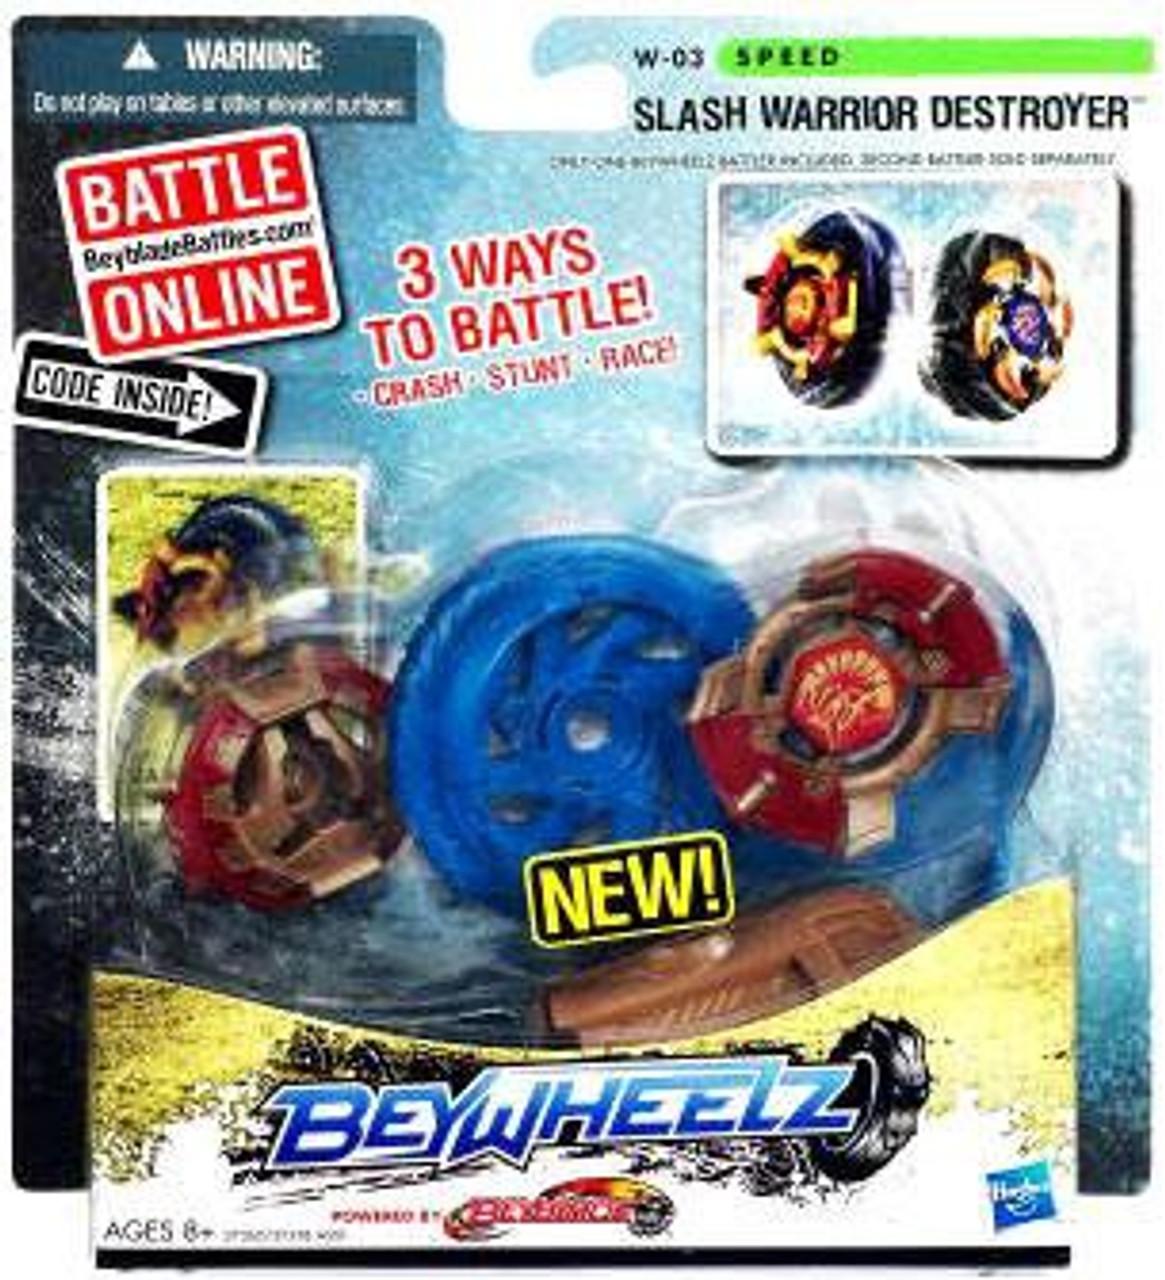 Beyblade Beywheelz Slash Warrior Destroyer W-03